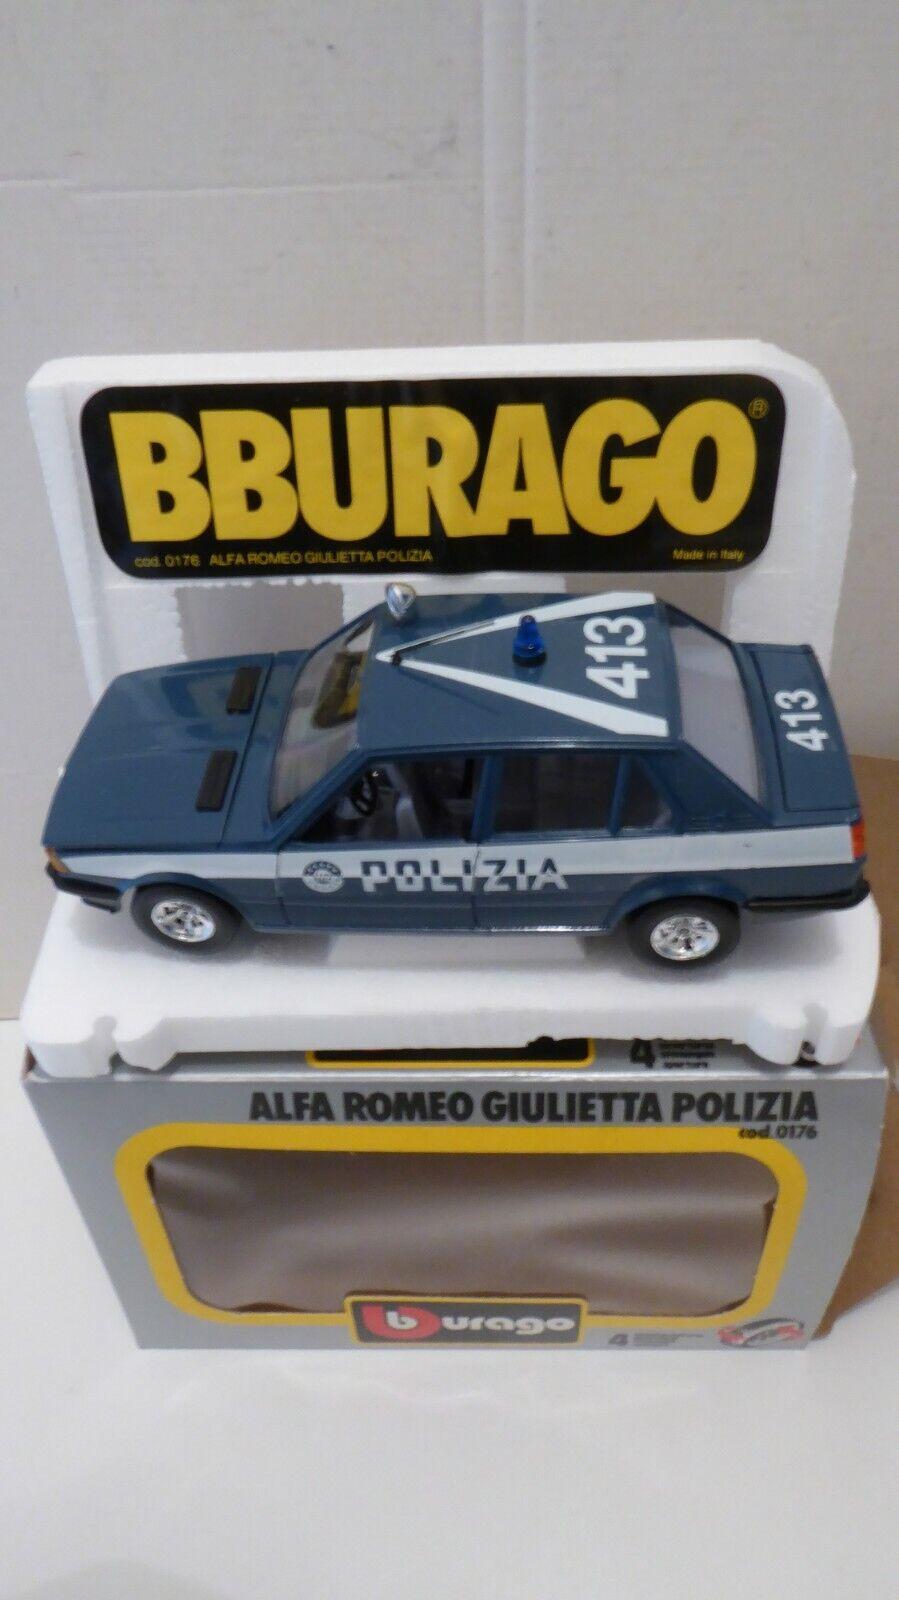 RARE 1 24 Burago Bburago ALFA ROMEO GIULIETTA POLIZIA COD. 0176 TOP ++++